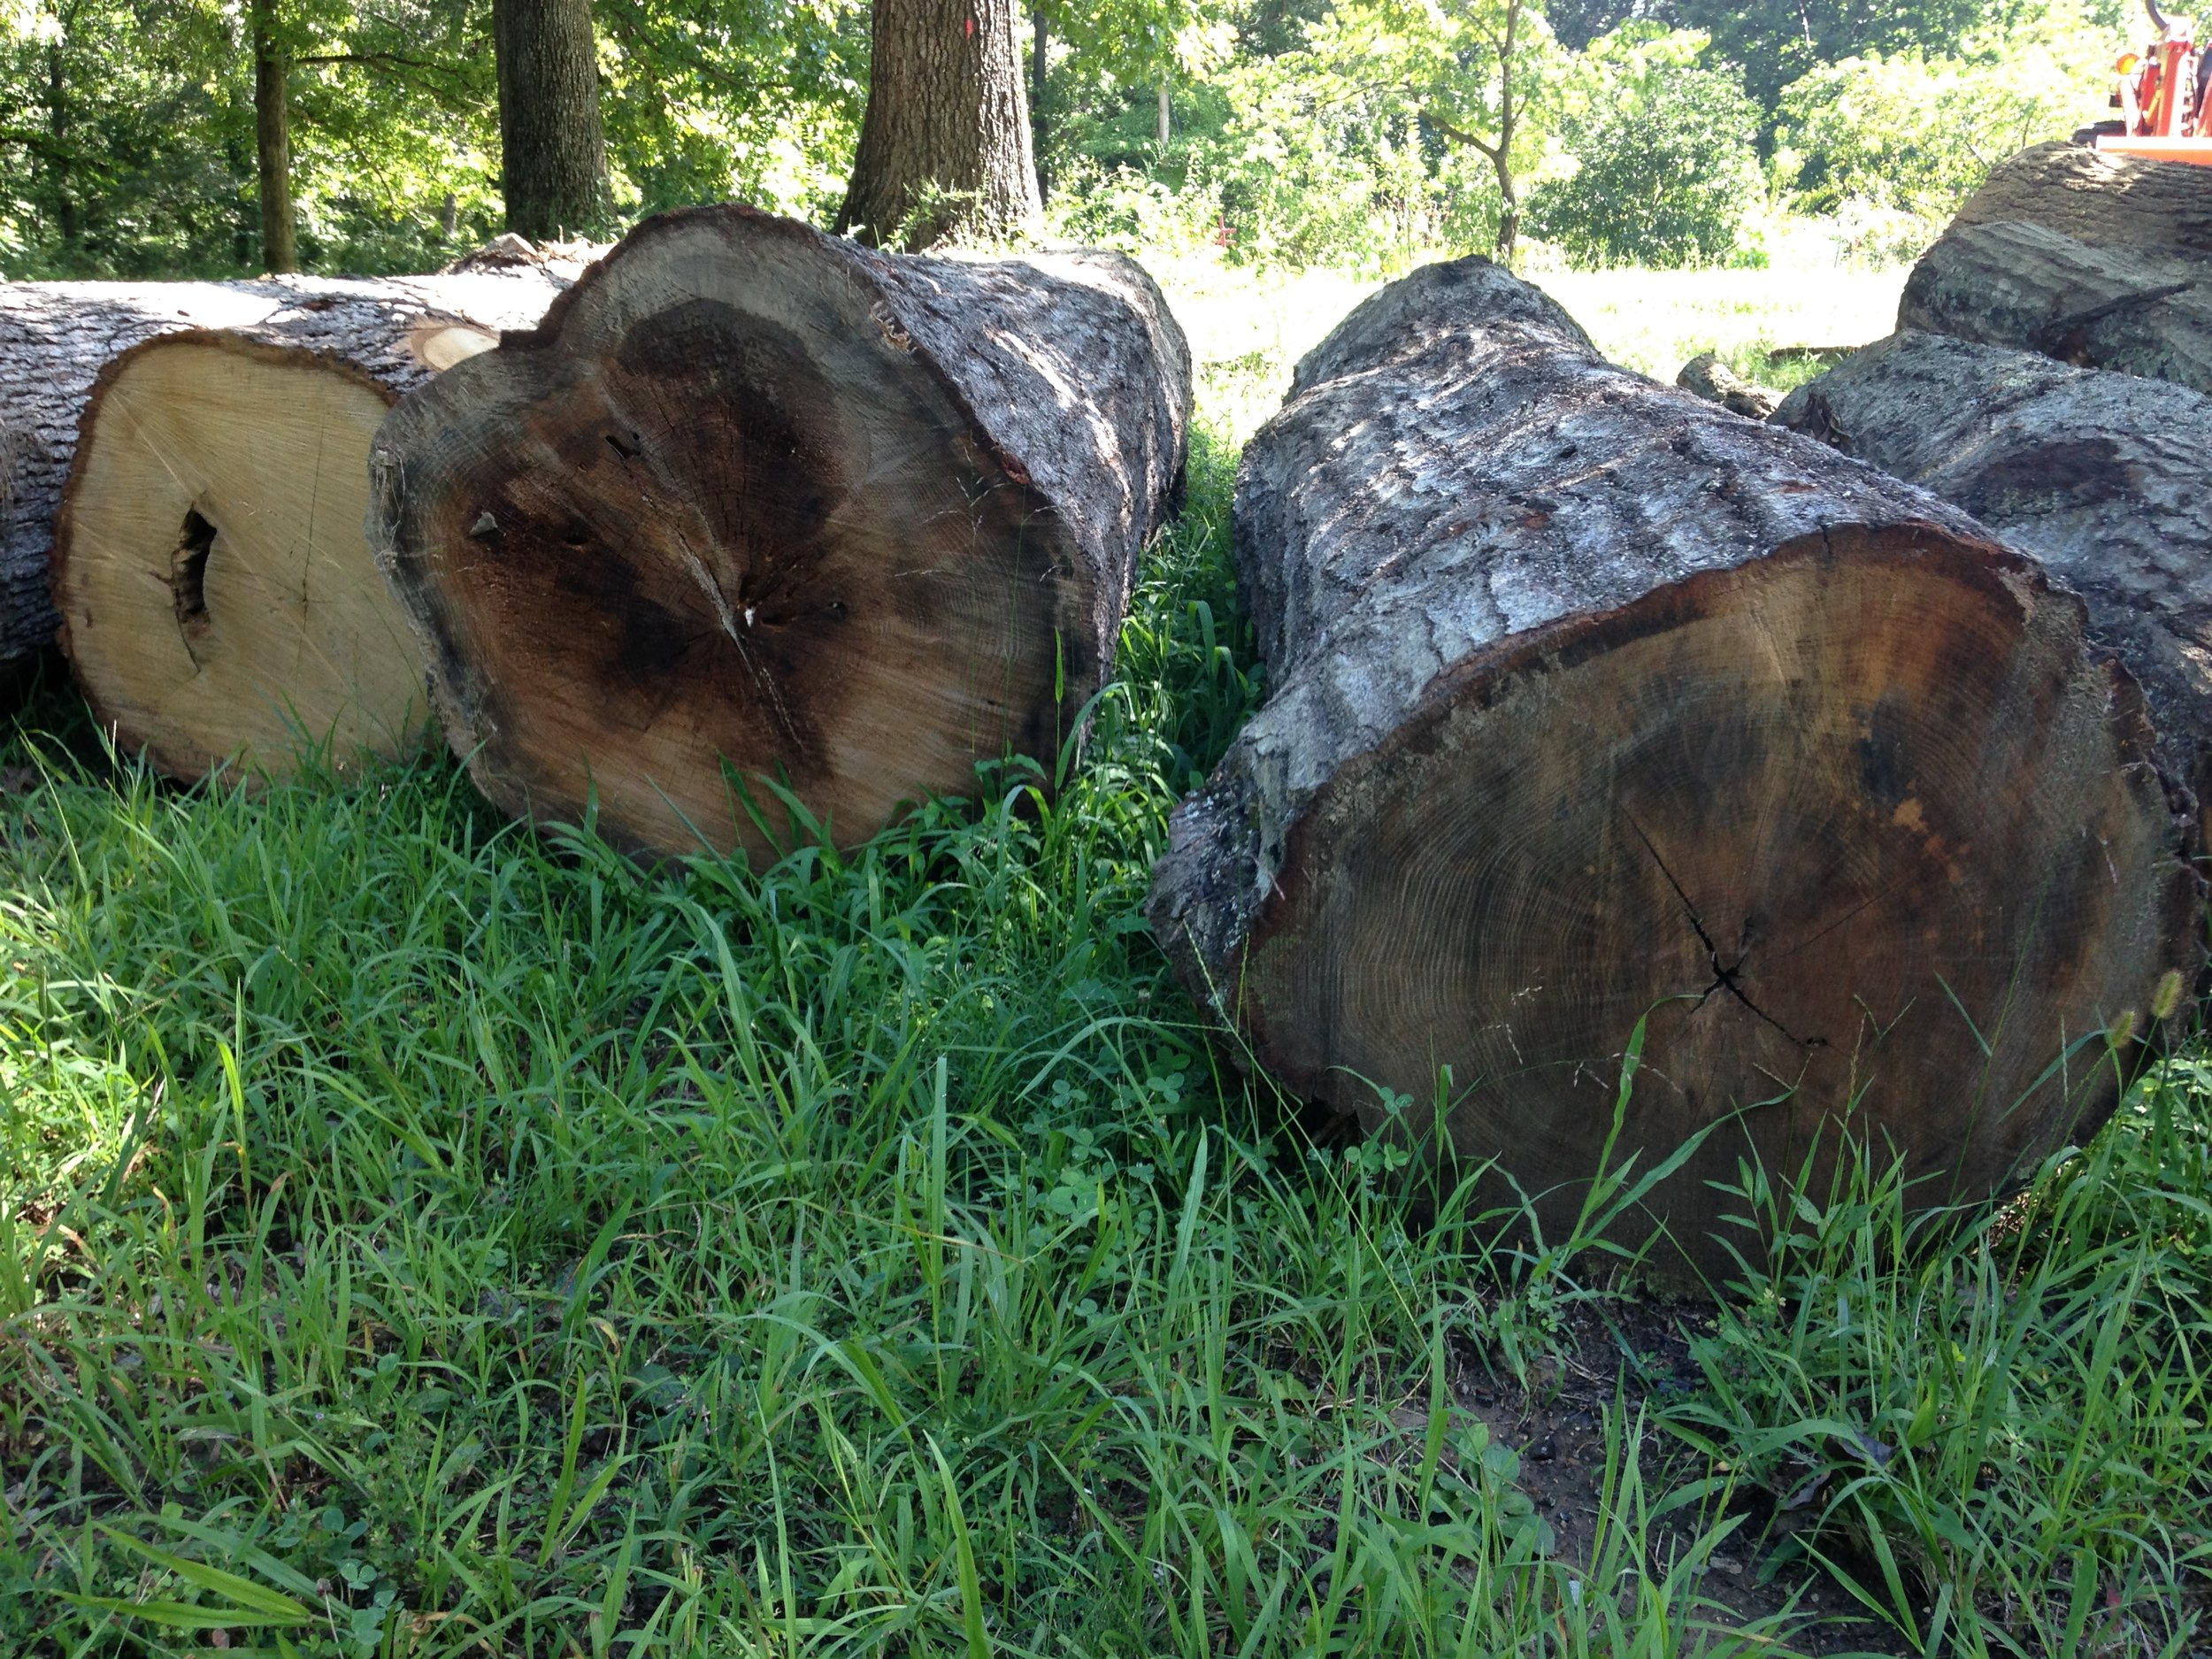 Oak logs waiting to be sawn.